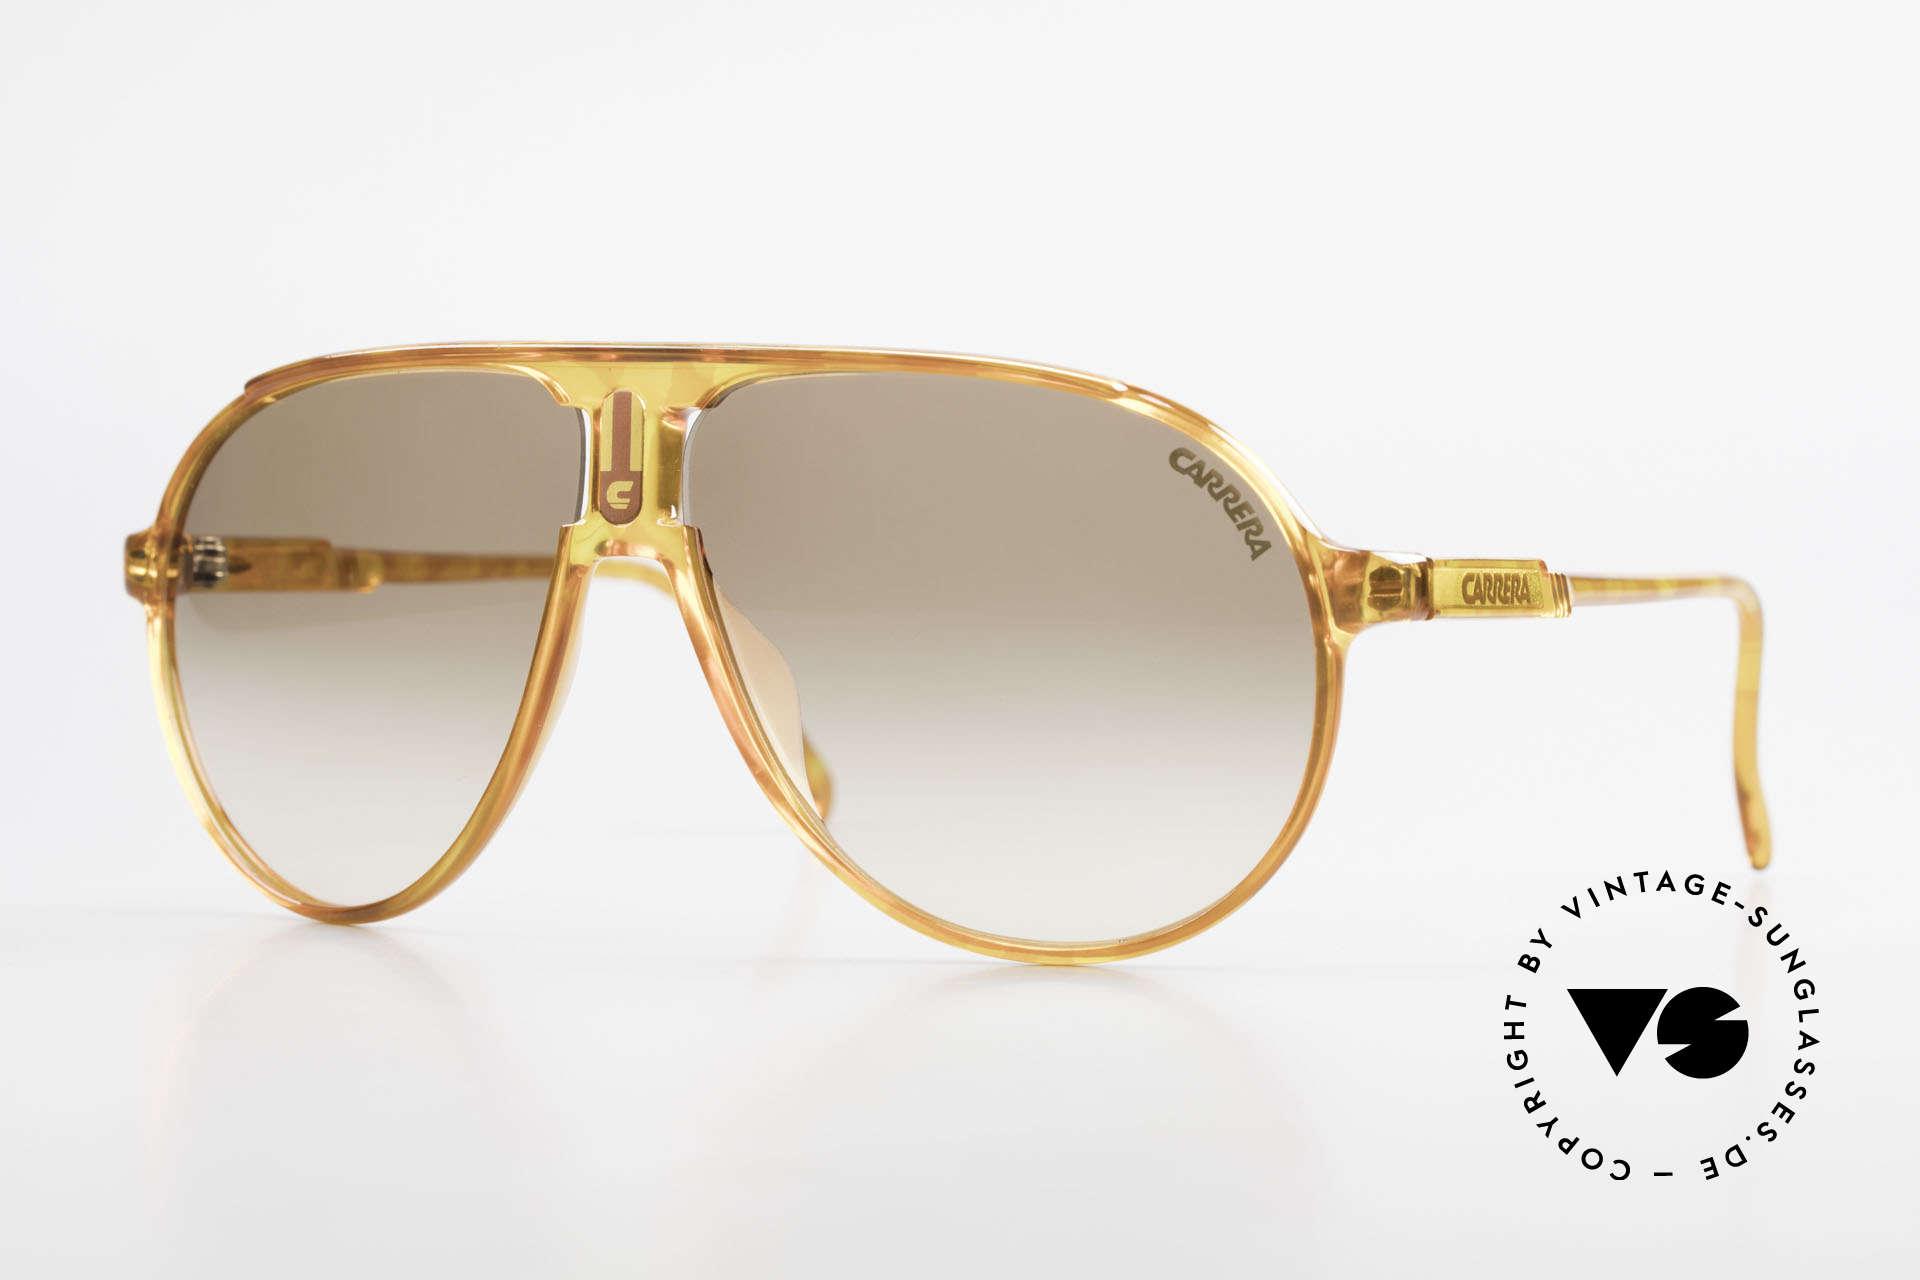 Carrera 5407 80's Sports Aviator Sunglasses, old 1980's sports aviator sunglasses by CARRERA, Made for Men